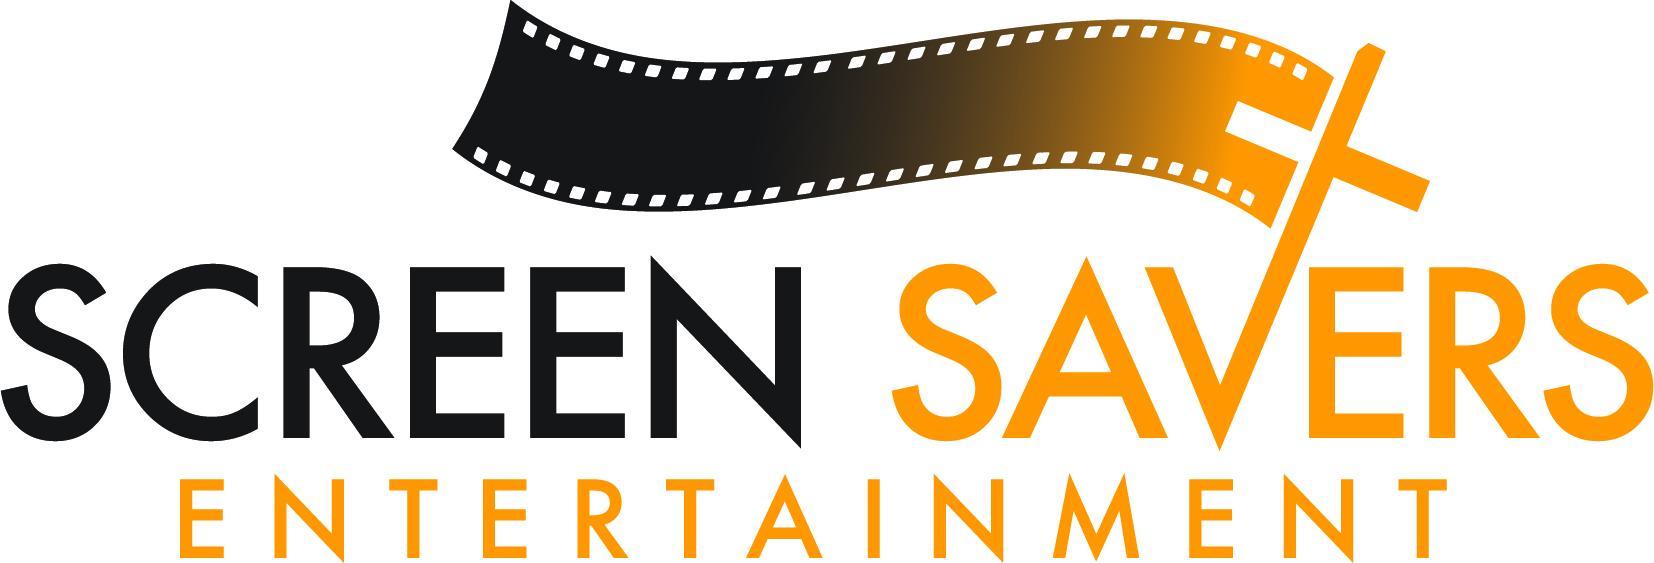 Screen Savers Entertainment